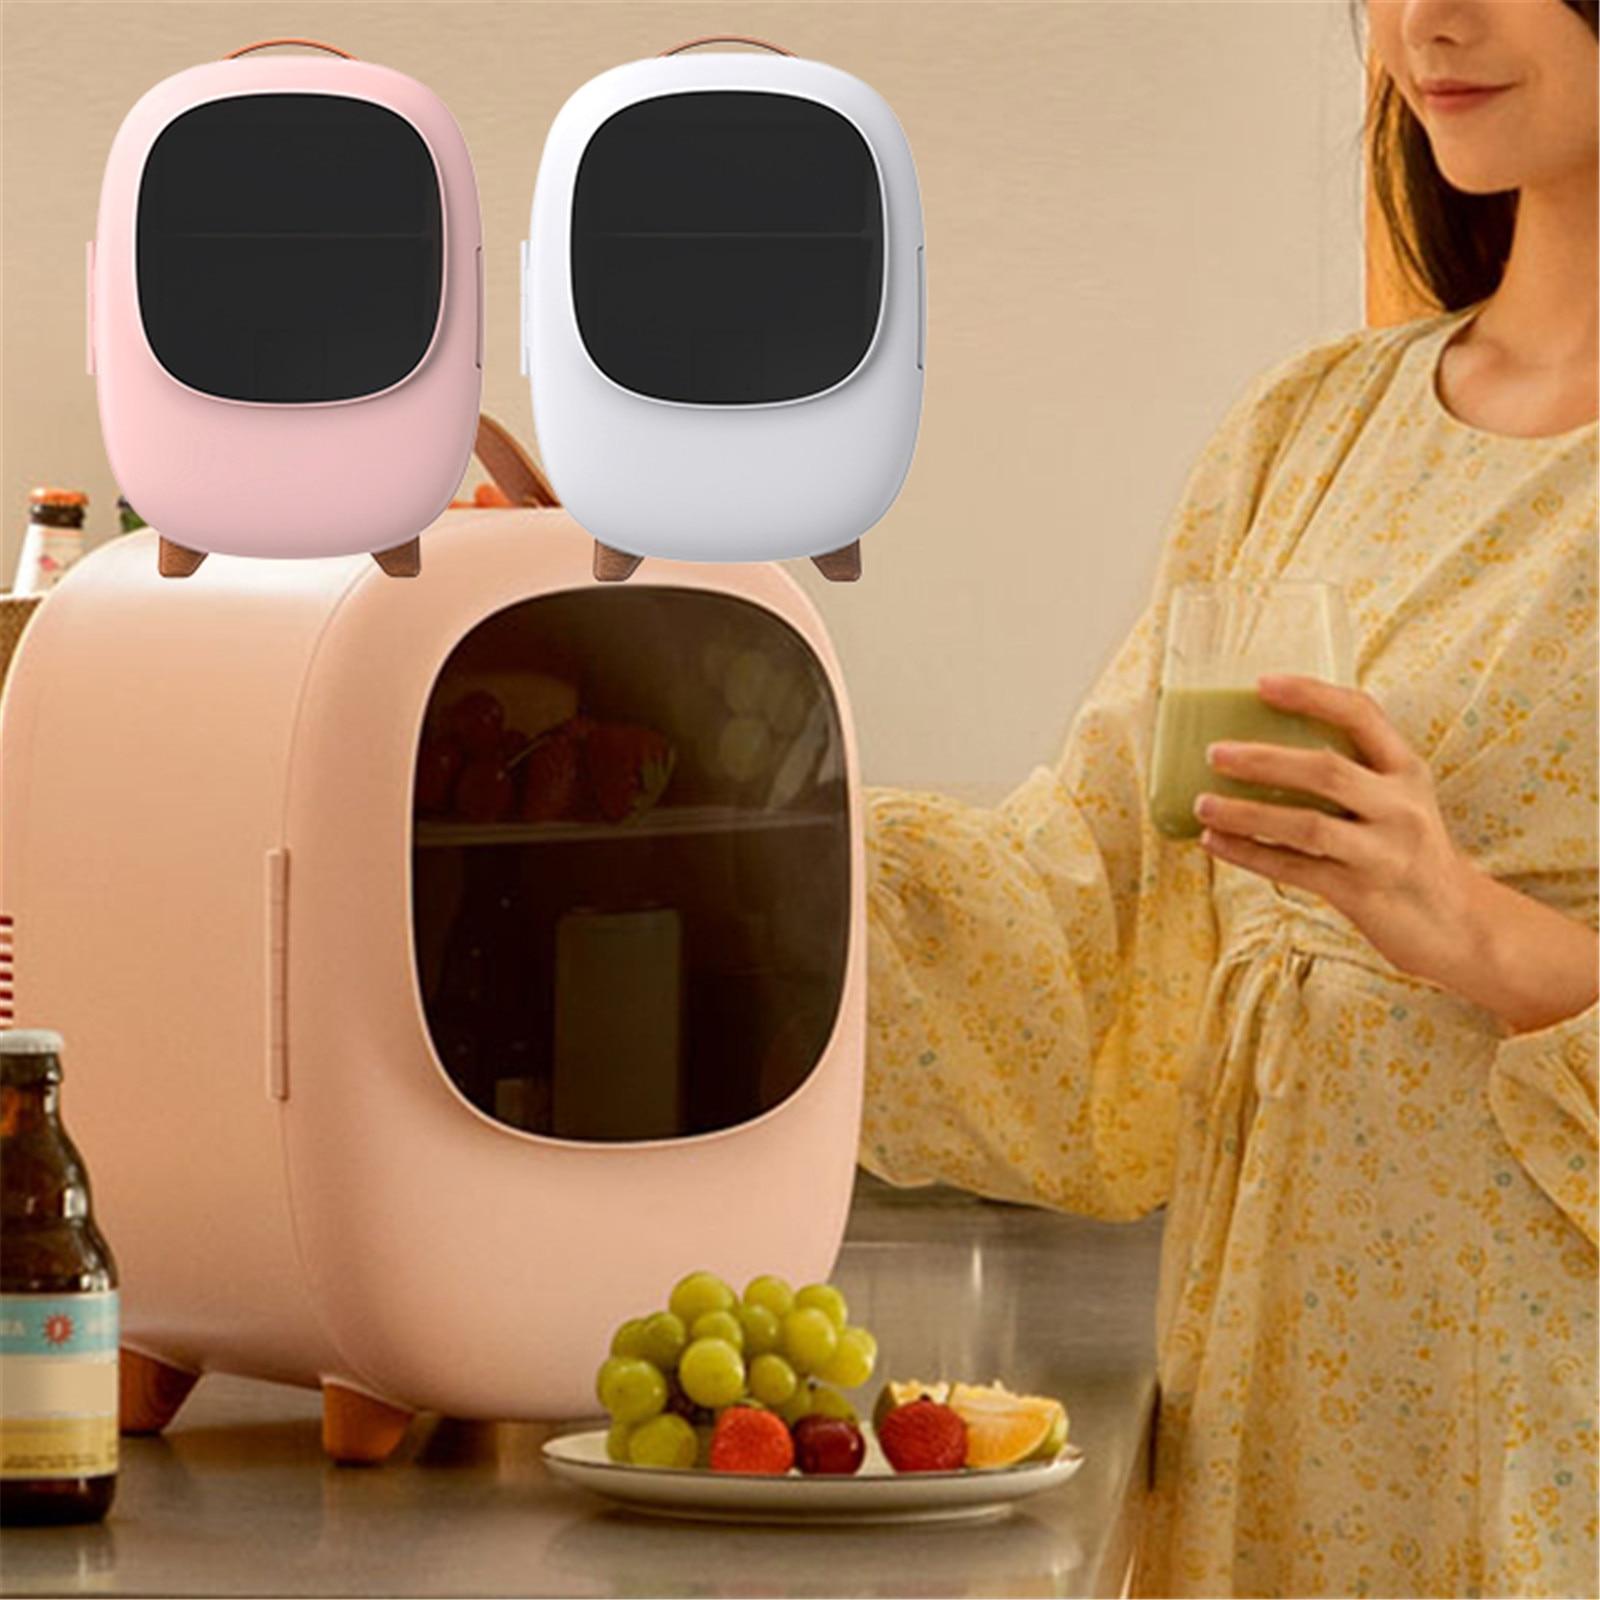 Makeup Fridge Mini 8L Refrigerator Energy-saving Car Dual Purpose 60W Skin Care Beauty Fridge Heat Preservation For Room